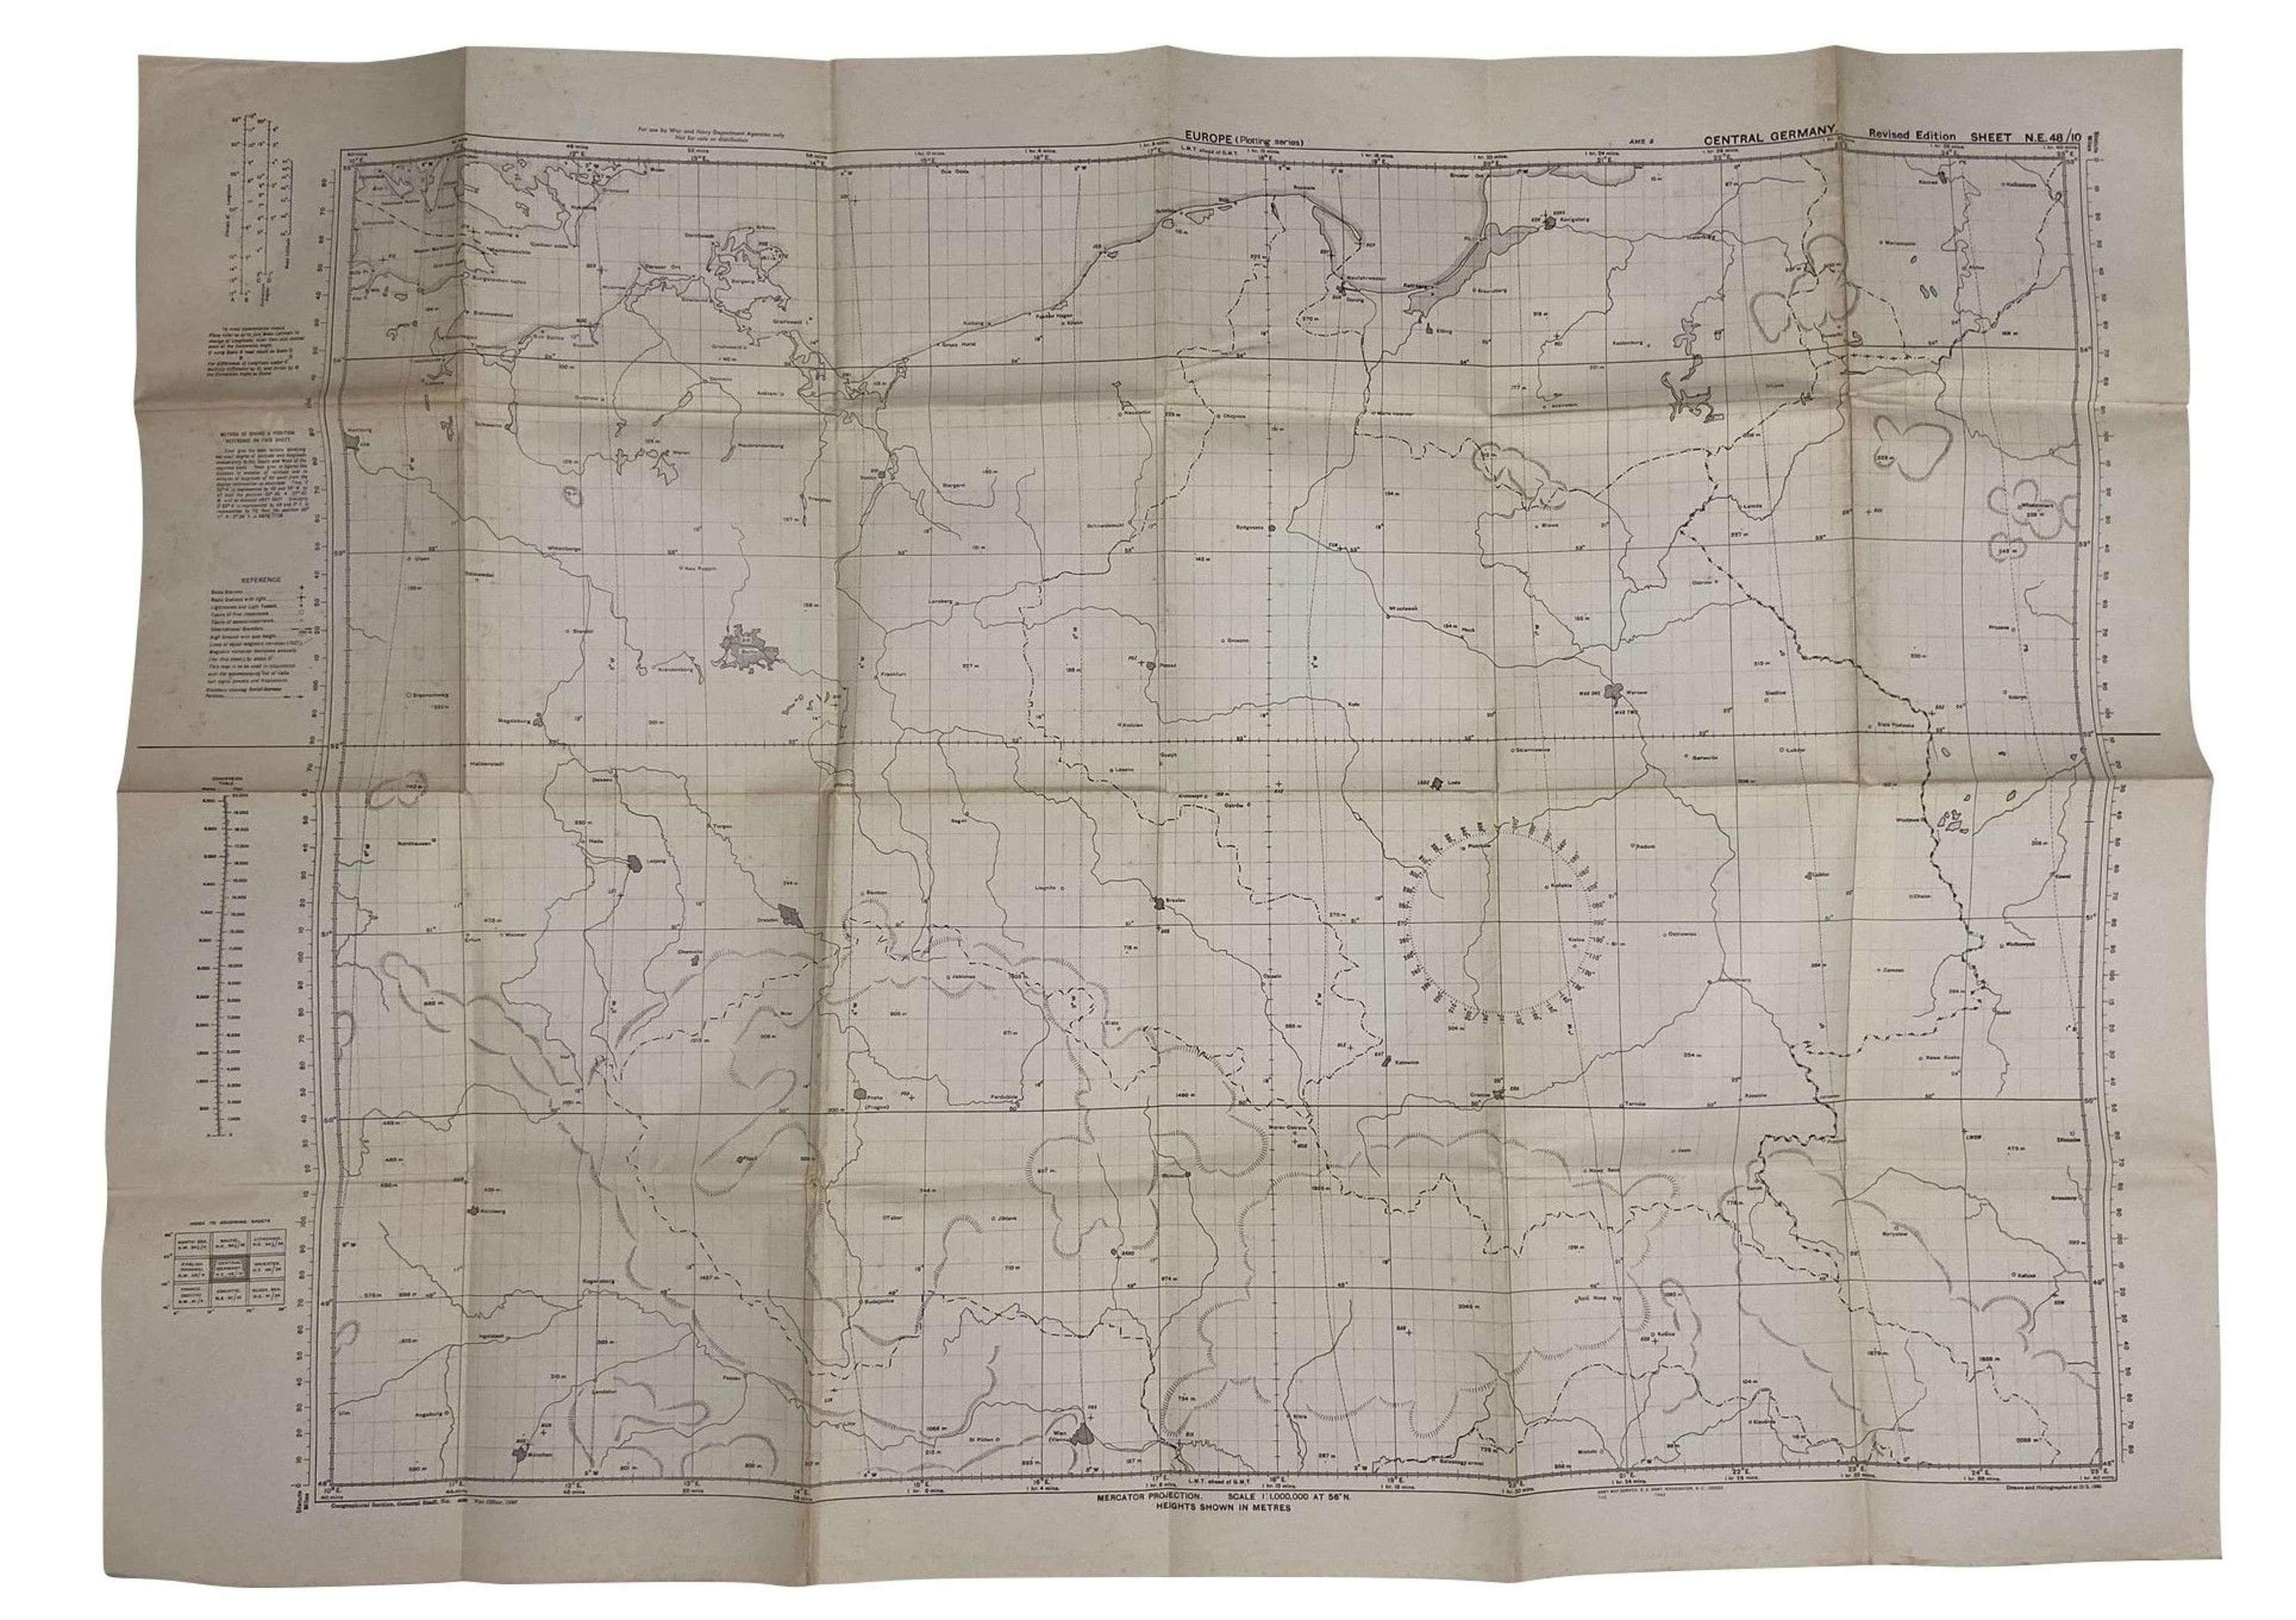 Original 1943 Dated USAAF Plotting Map of Europe